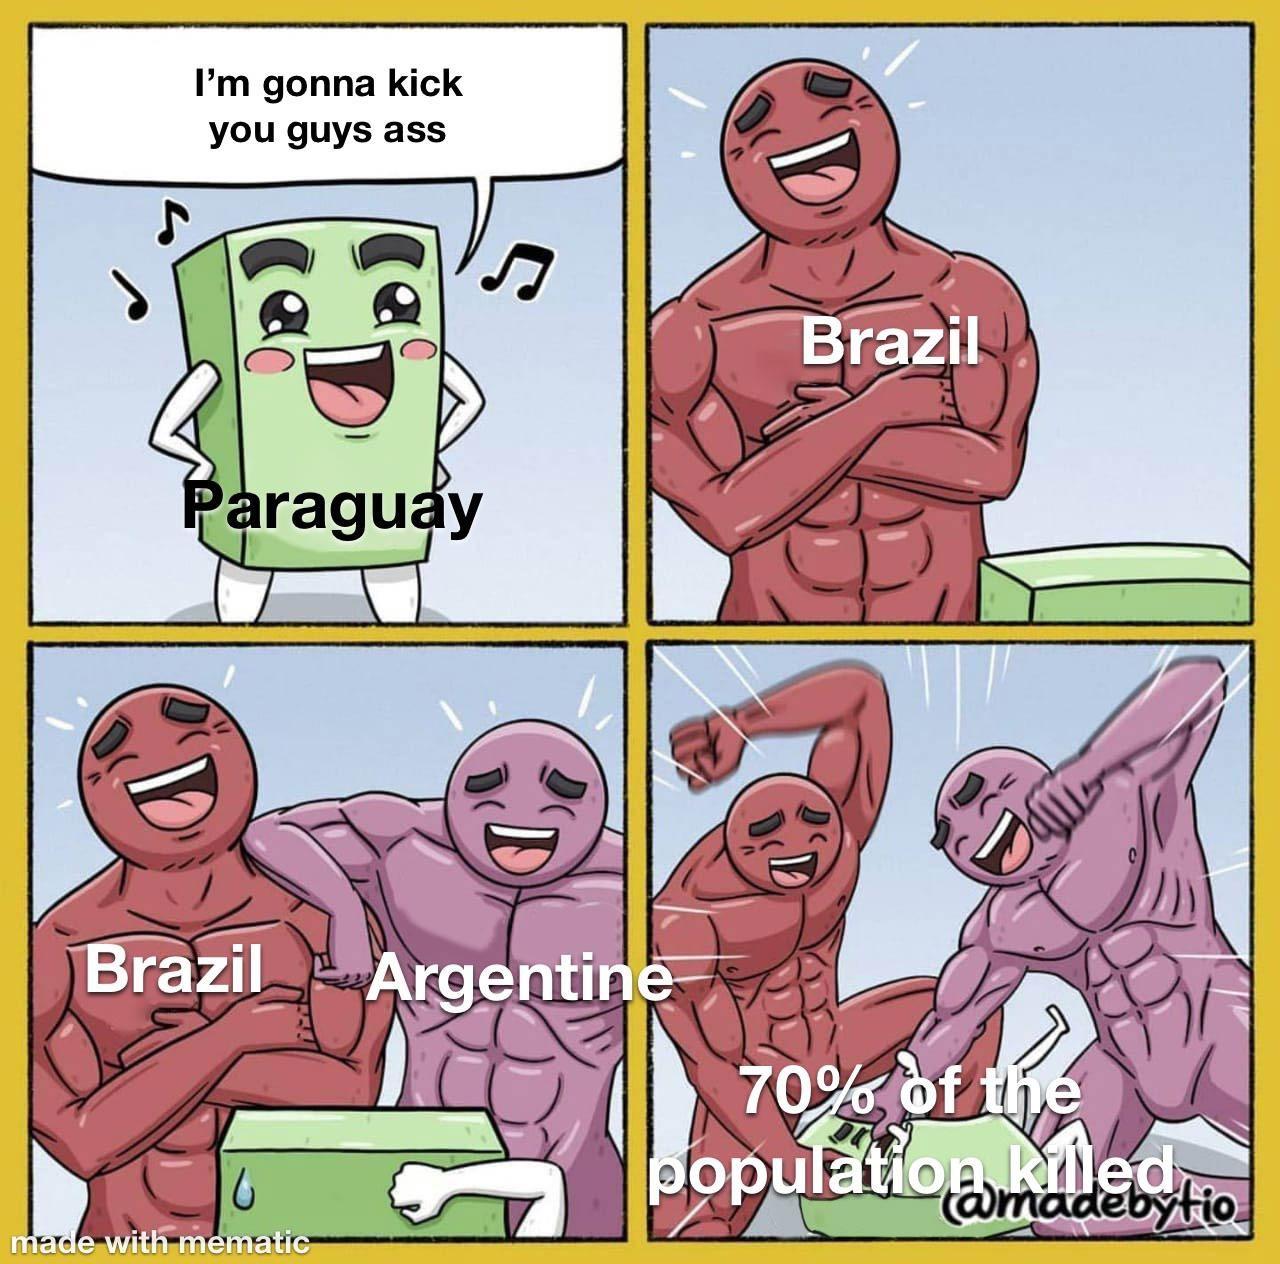 The Paraguayan war was more brutal than the American civil war.